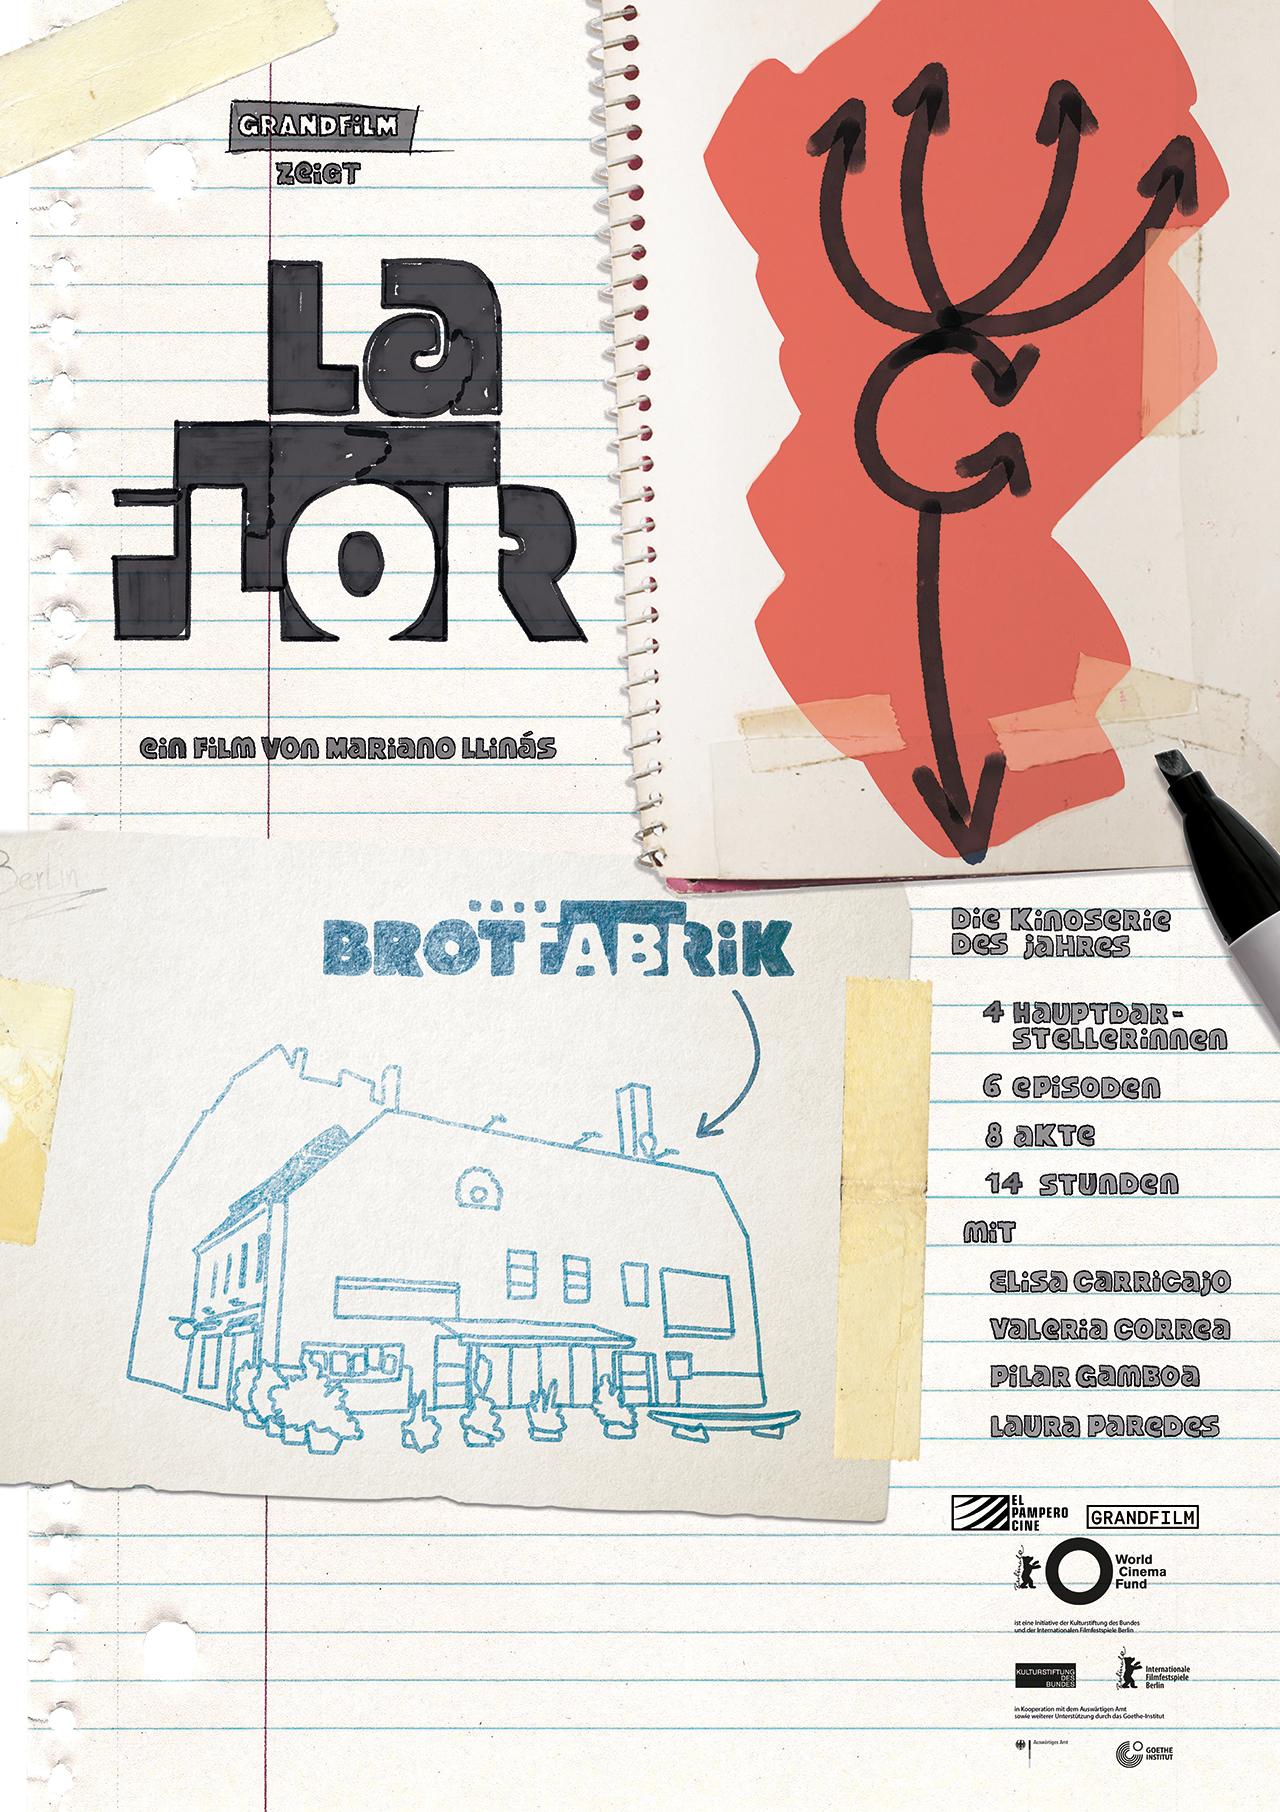 LaFlor_Plakat_Brotfabrik_digital